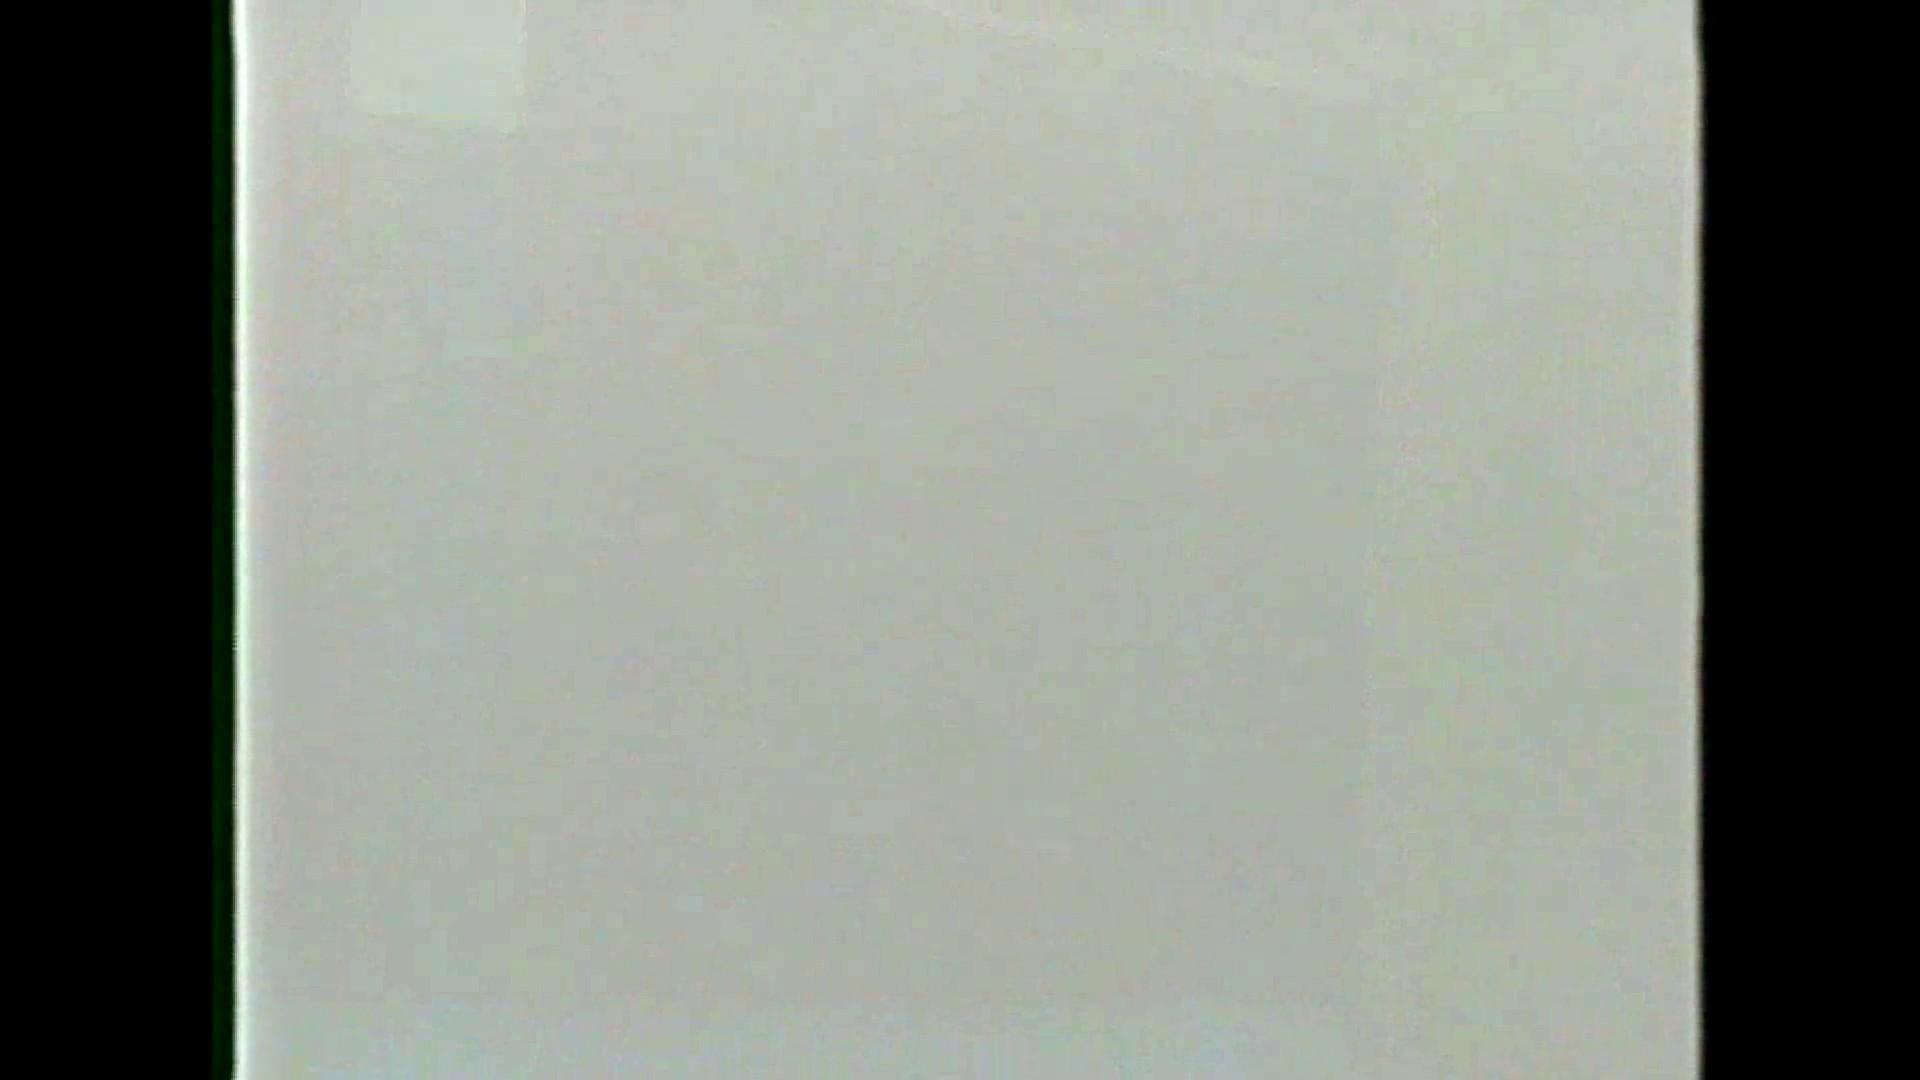 GAYBOY宏のオカズ倉庫Vol.3-1 まじ生挿入 | 口内に発射 ペニス画像 98pic 51